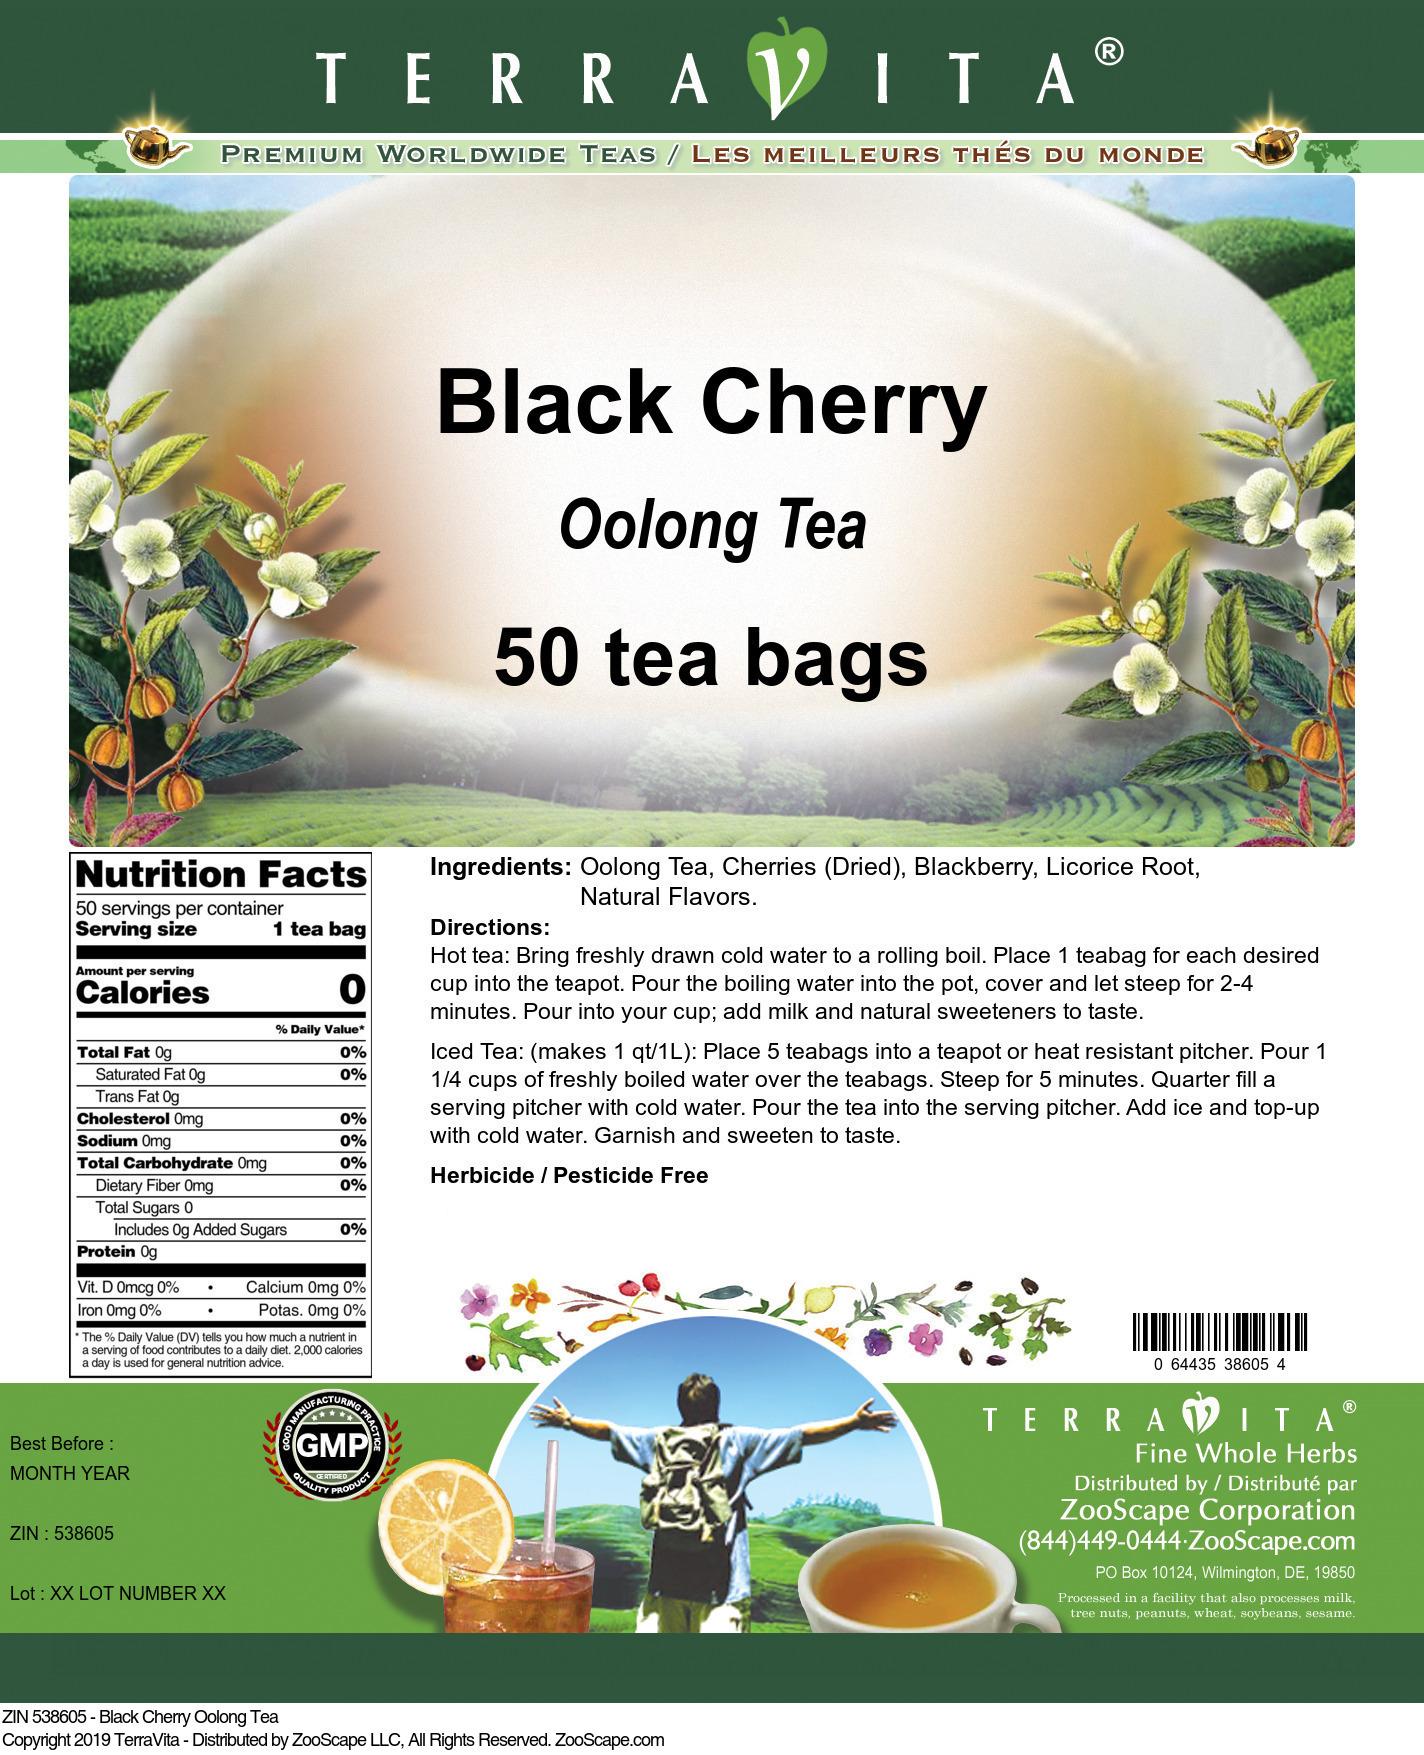 Black Cherry Oolong Tea